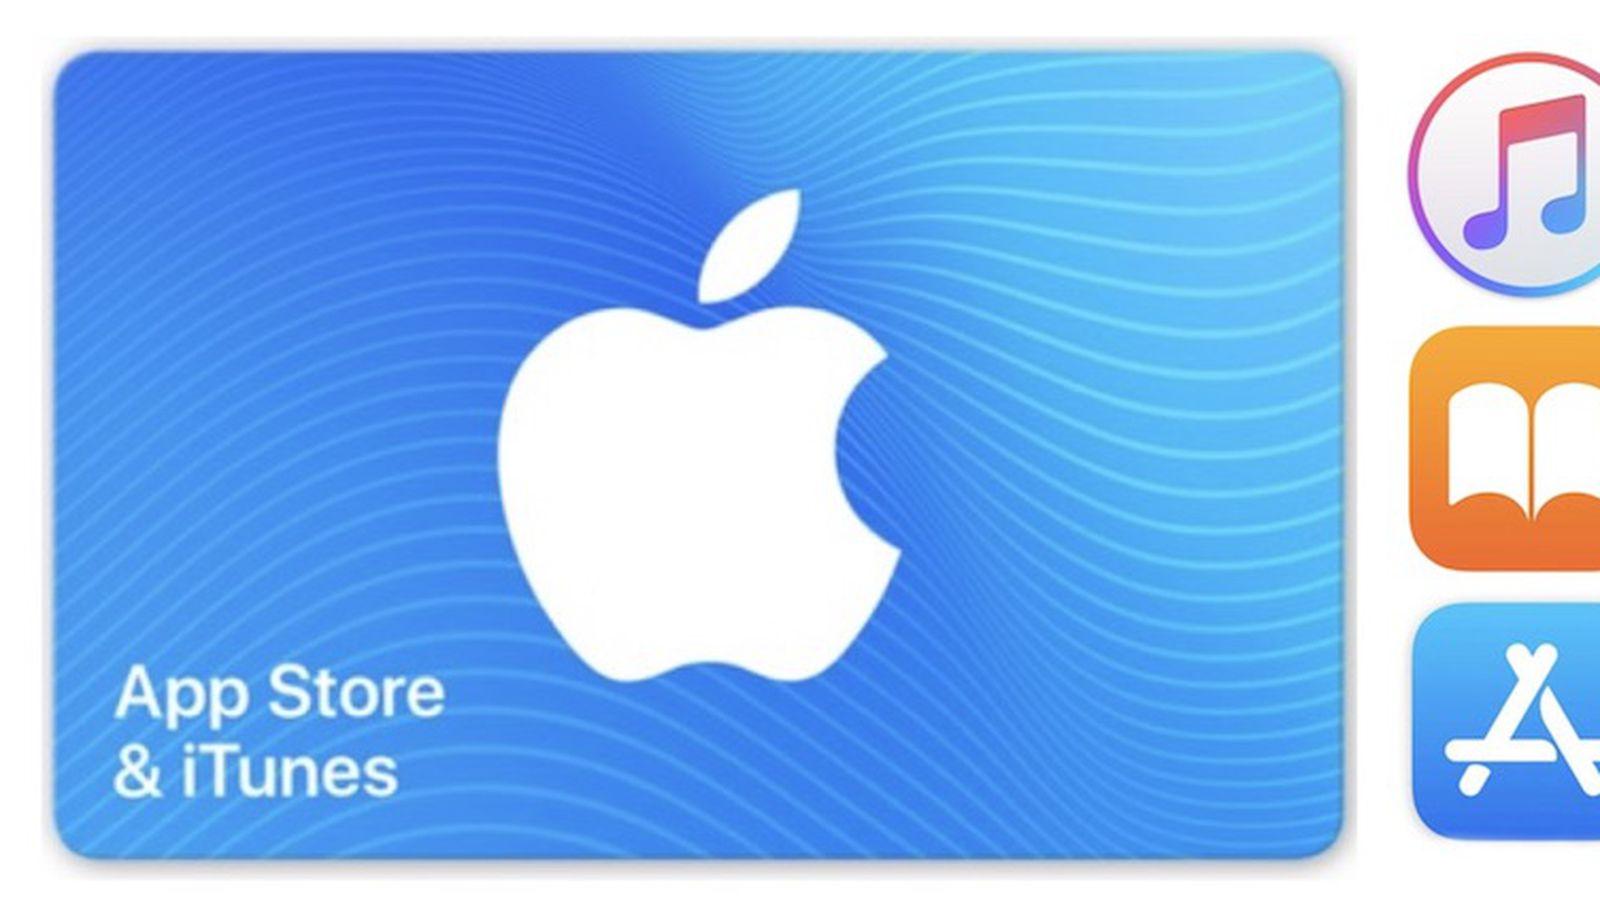 App store card